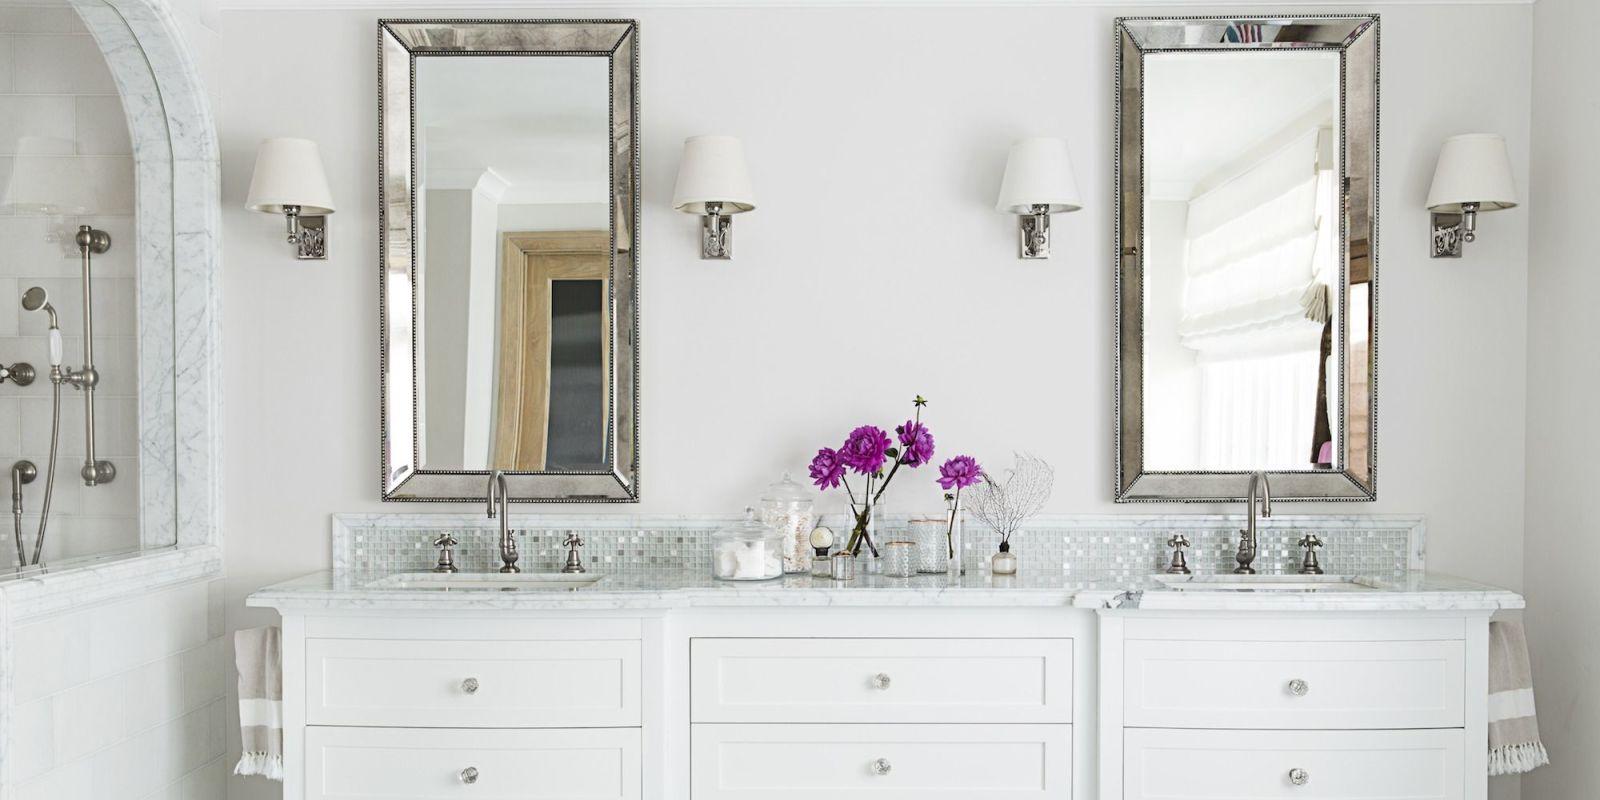 23 Bathroom Decorating Ideas  Pictures of Bathroom Decor